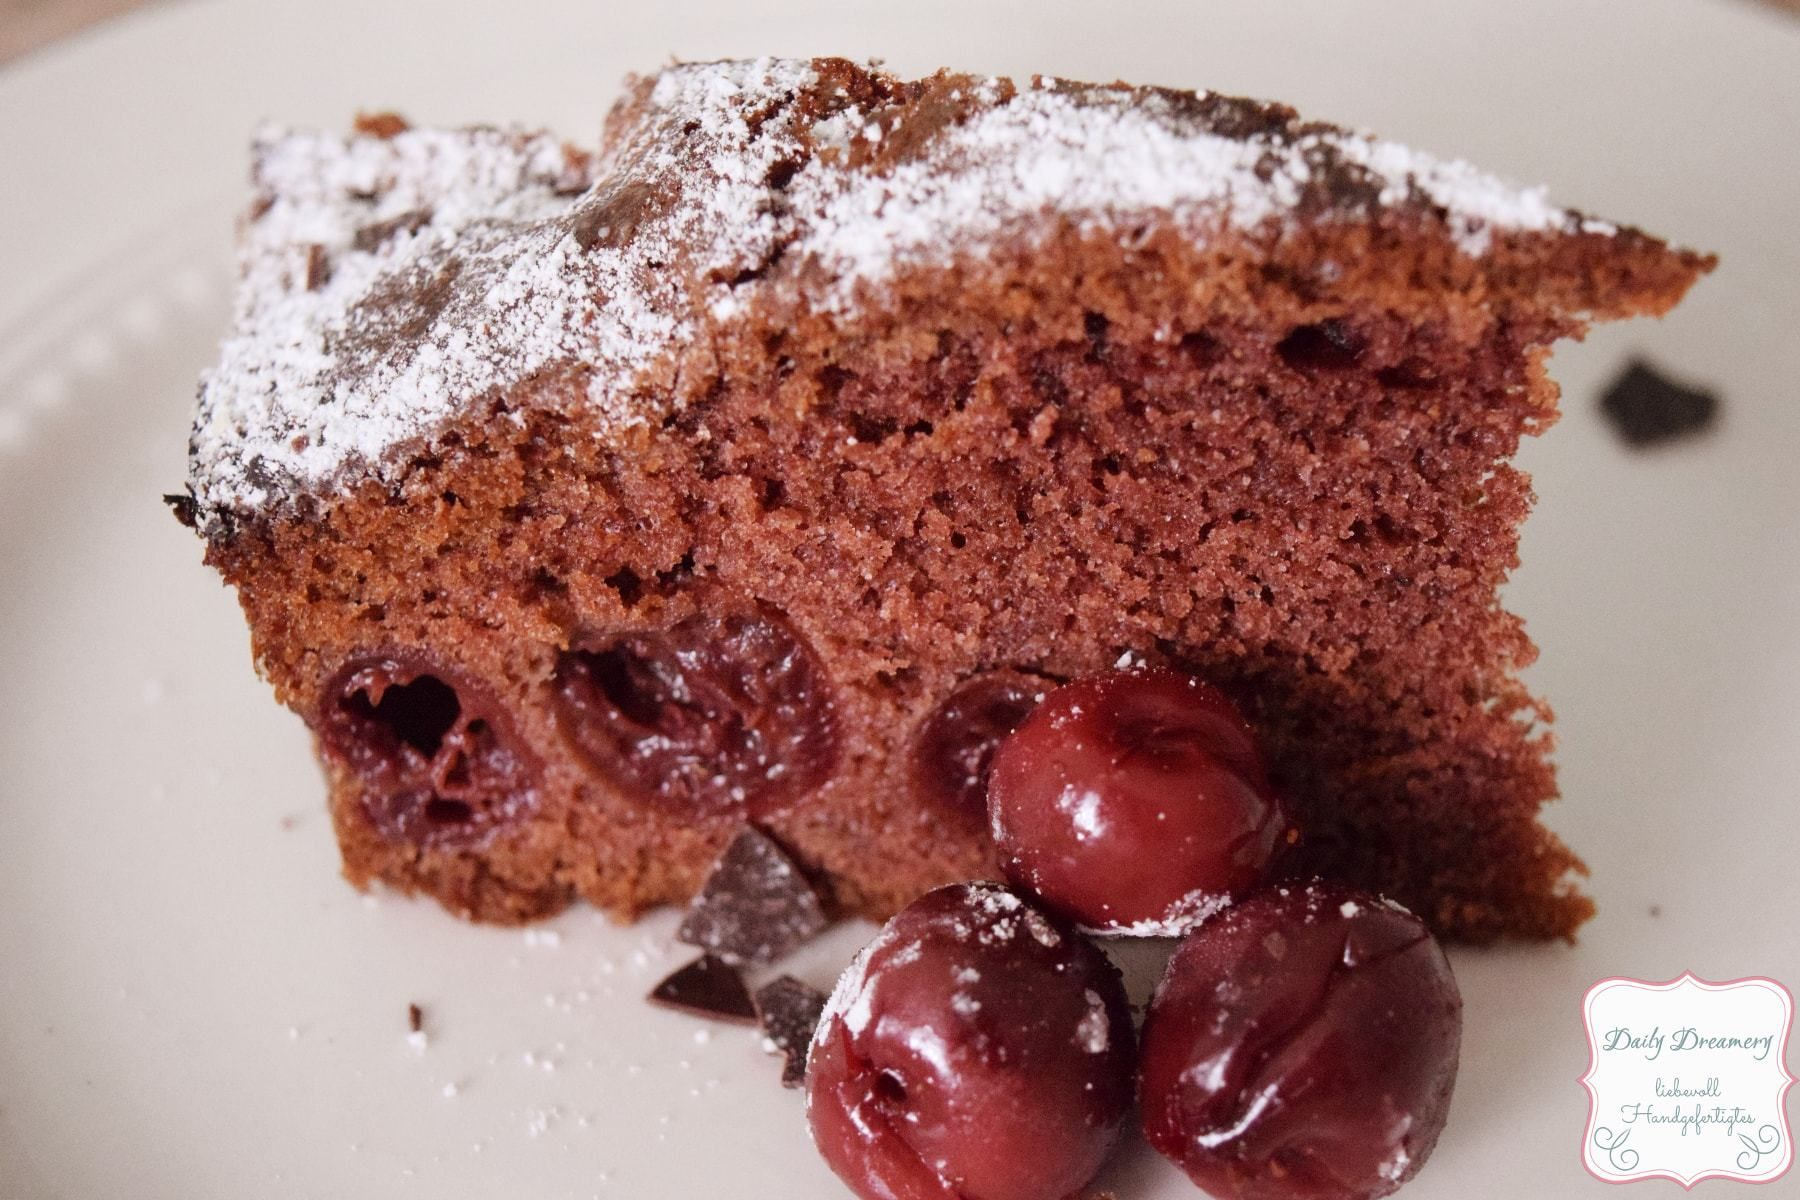 Luftig Lockerer Schoko Kirsch Kuchen Rezept Kuchenrezepte